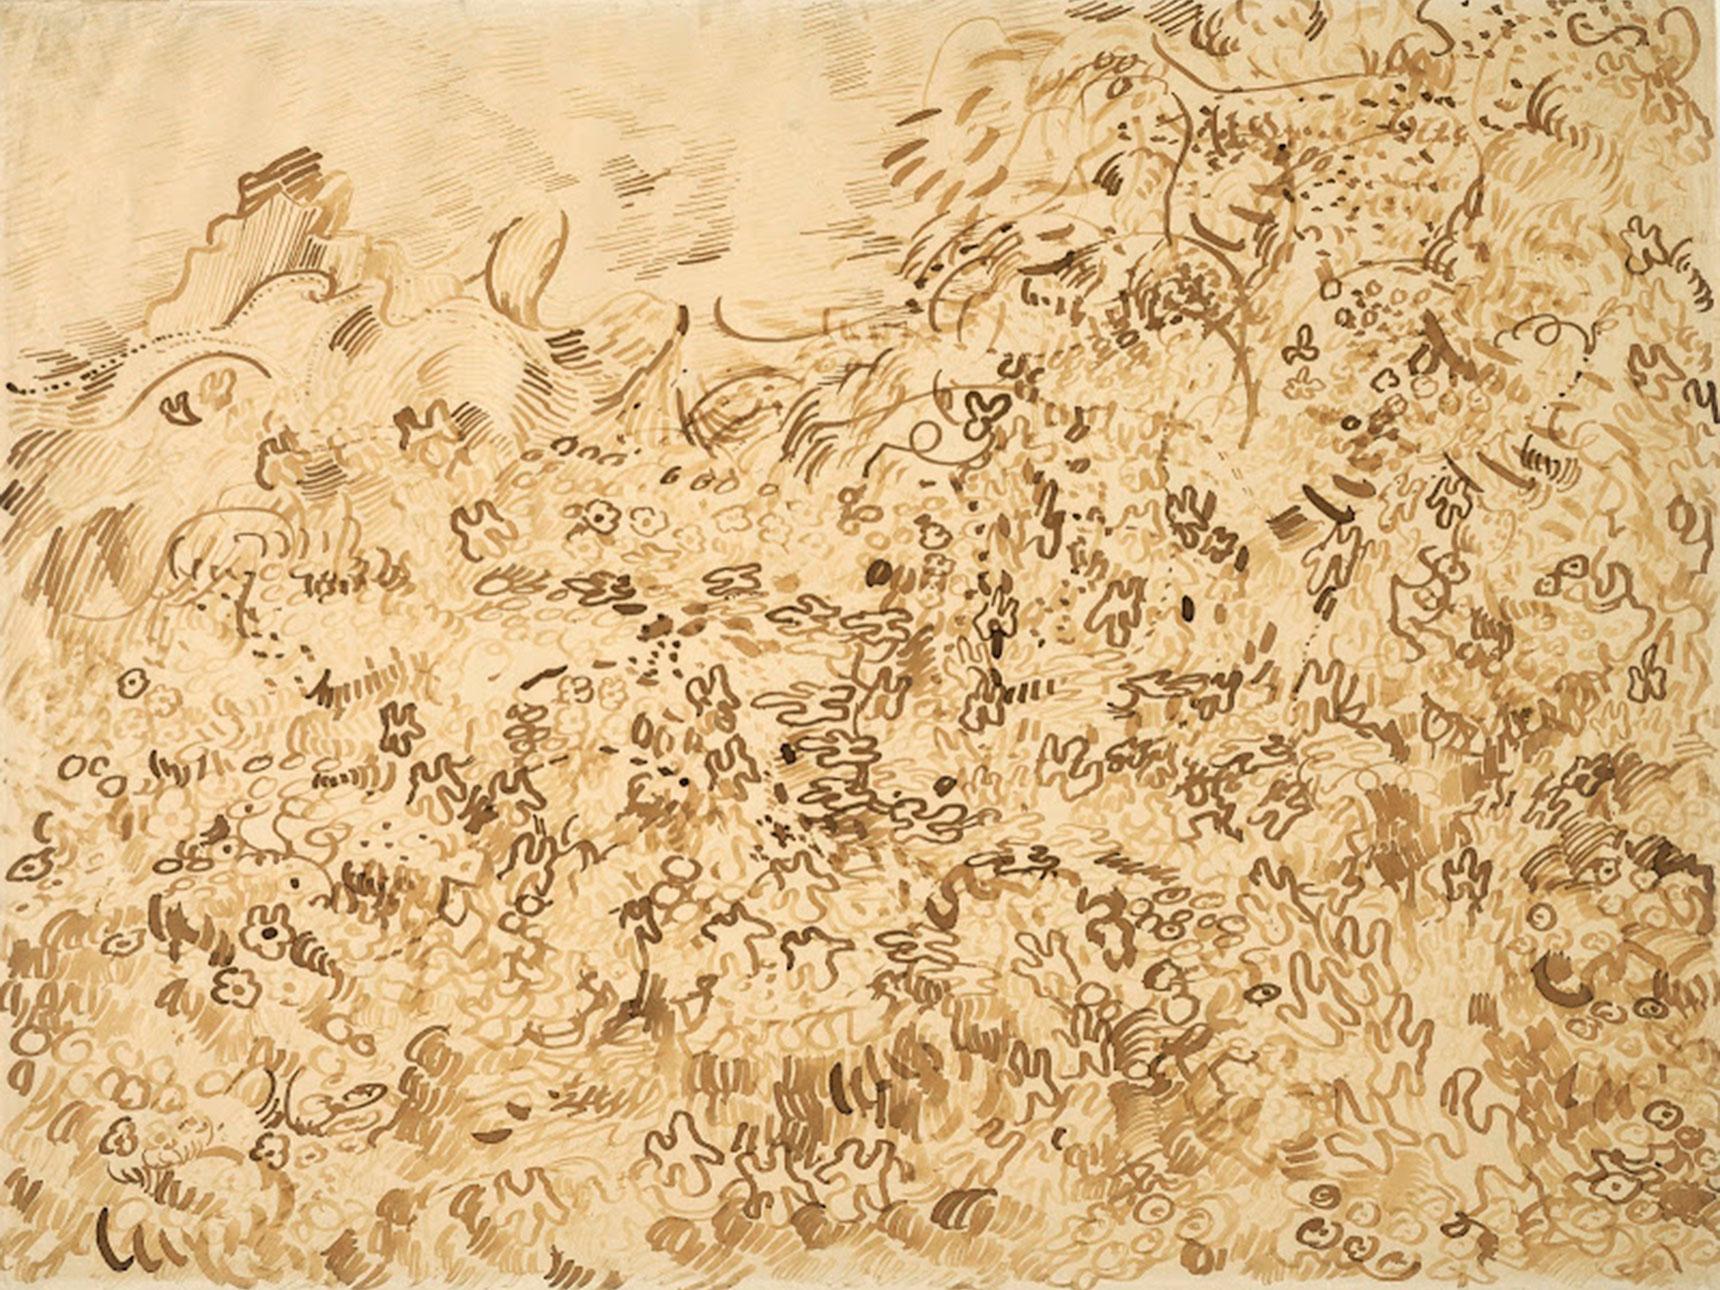 Vincent van Gogh's drawing, Wild Vegetation